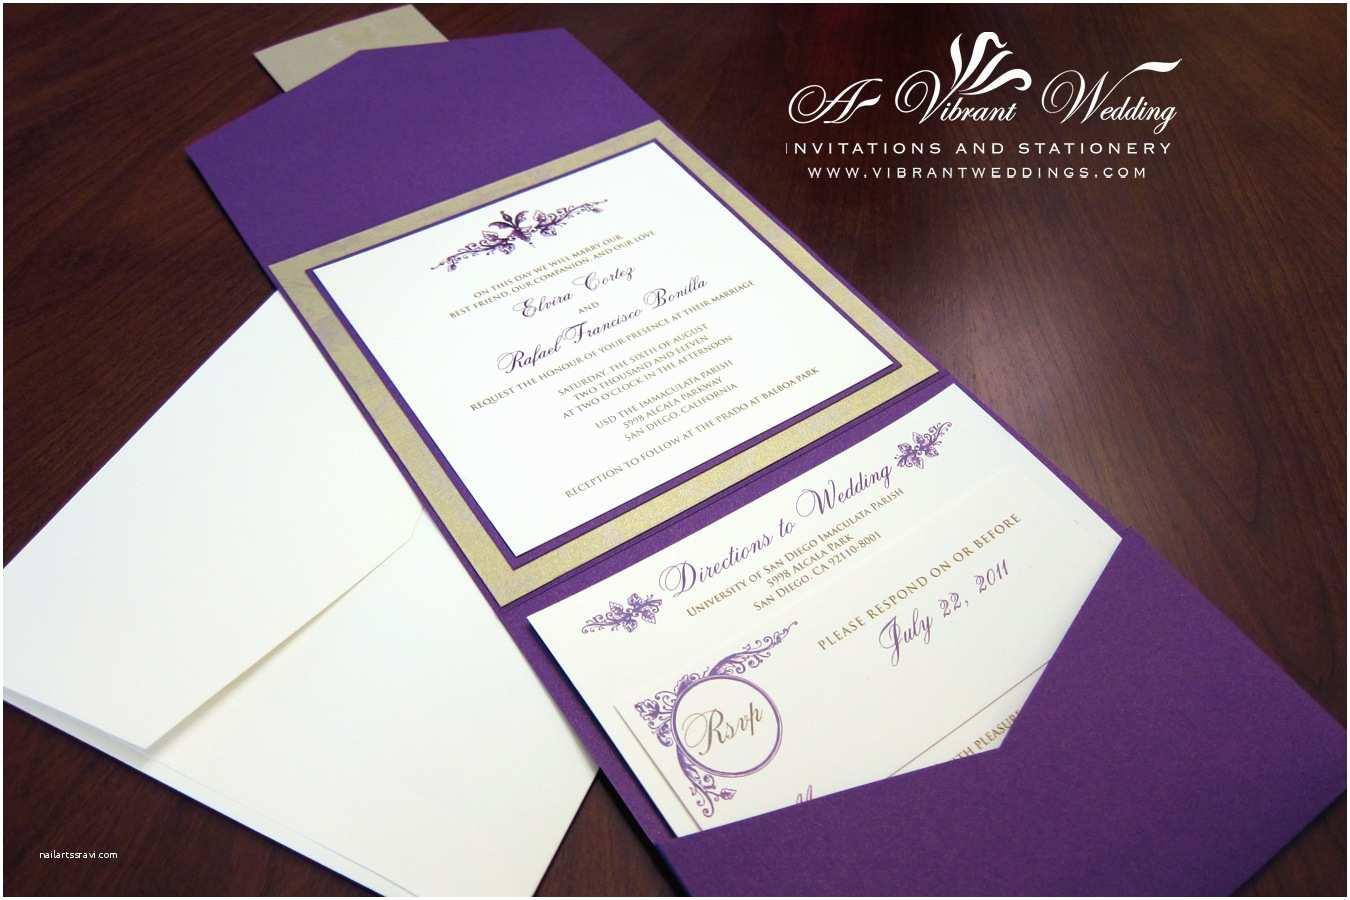 Formal Wedding Invitations formal Wedding Invitations 六月 2013